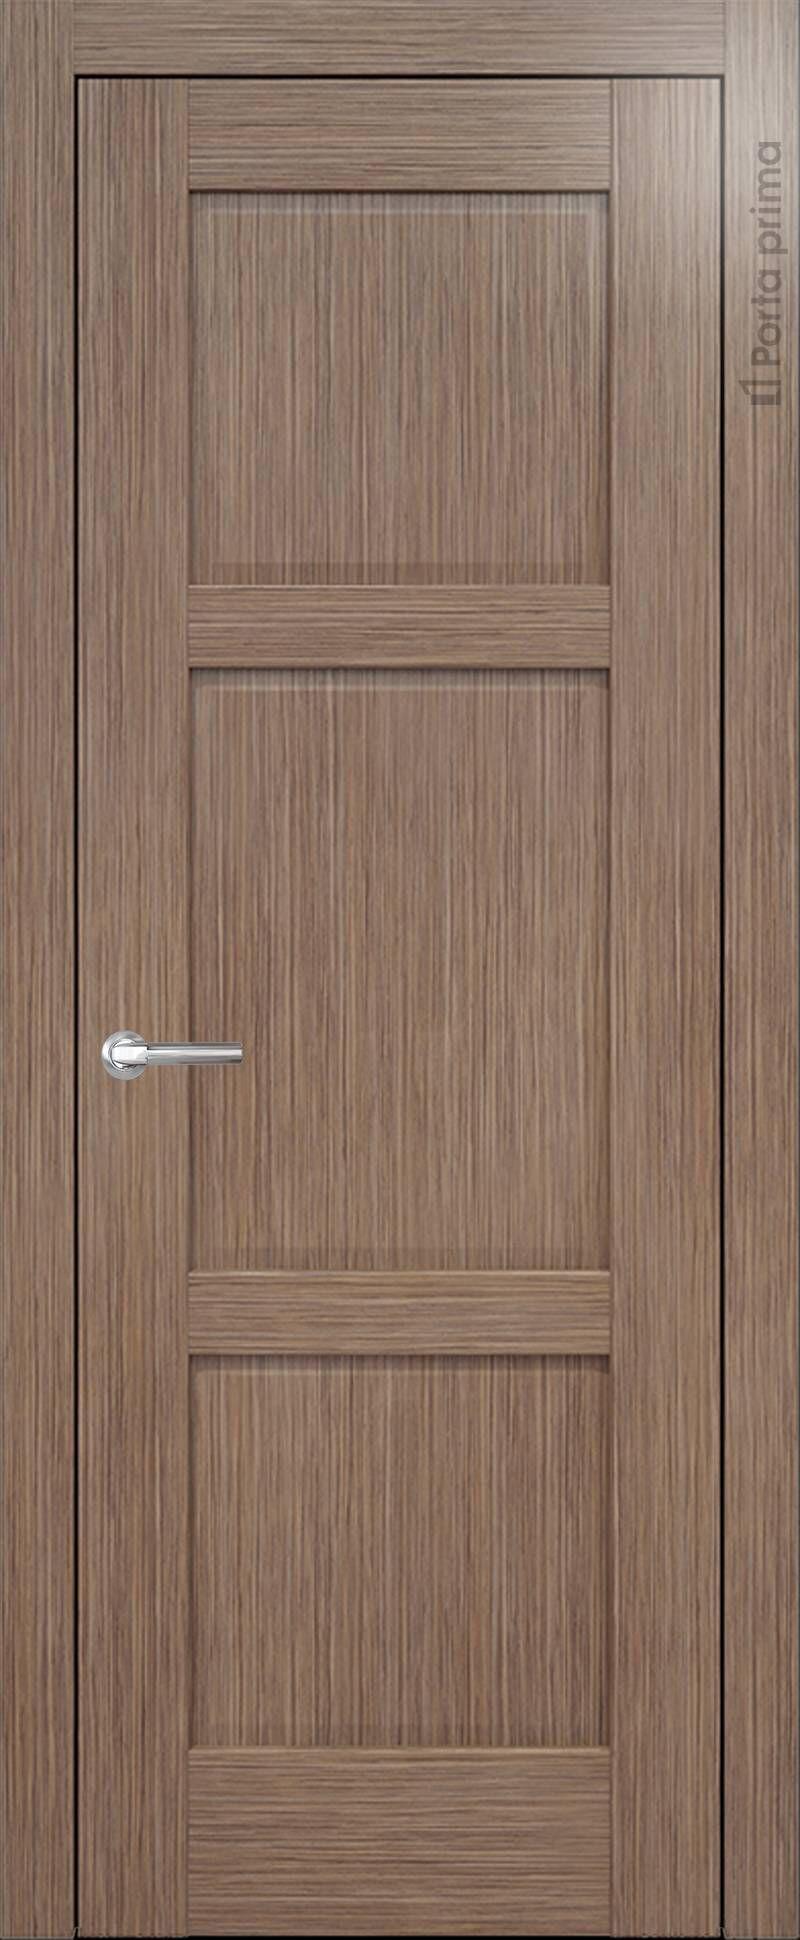 Siena цвет - Орех Без стекла (ДГ)